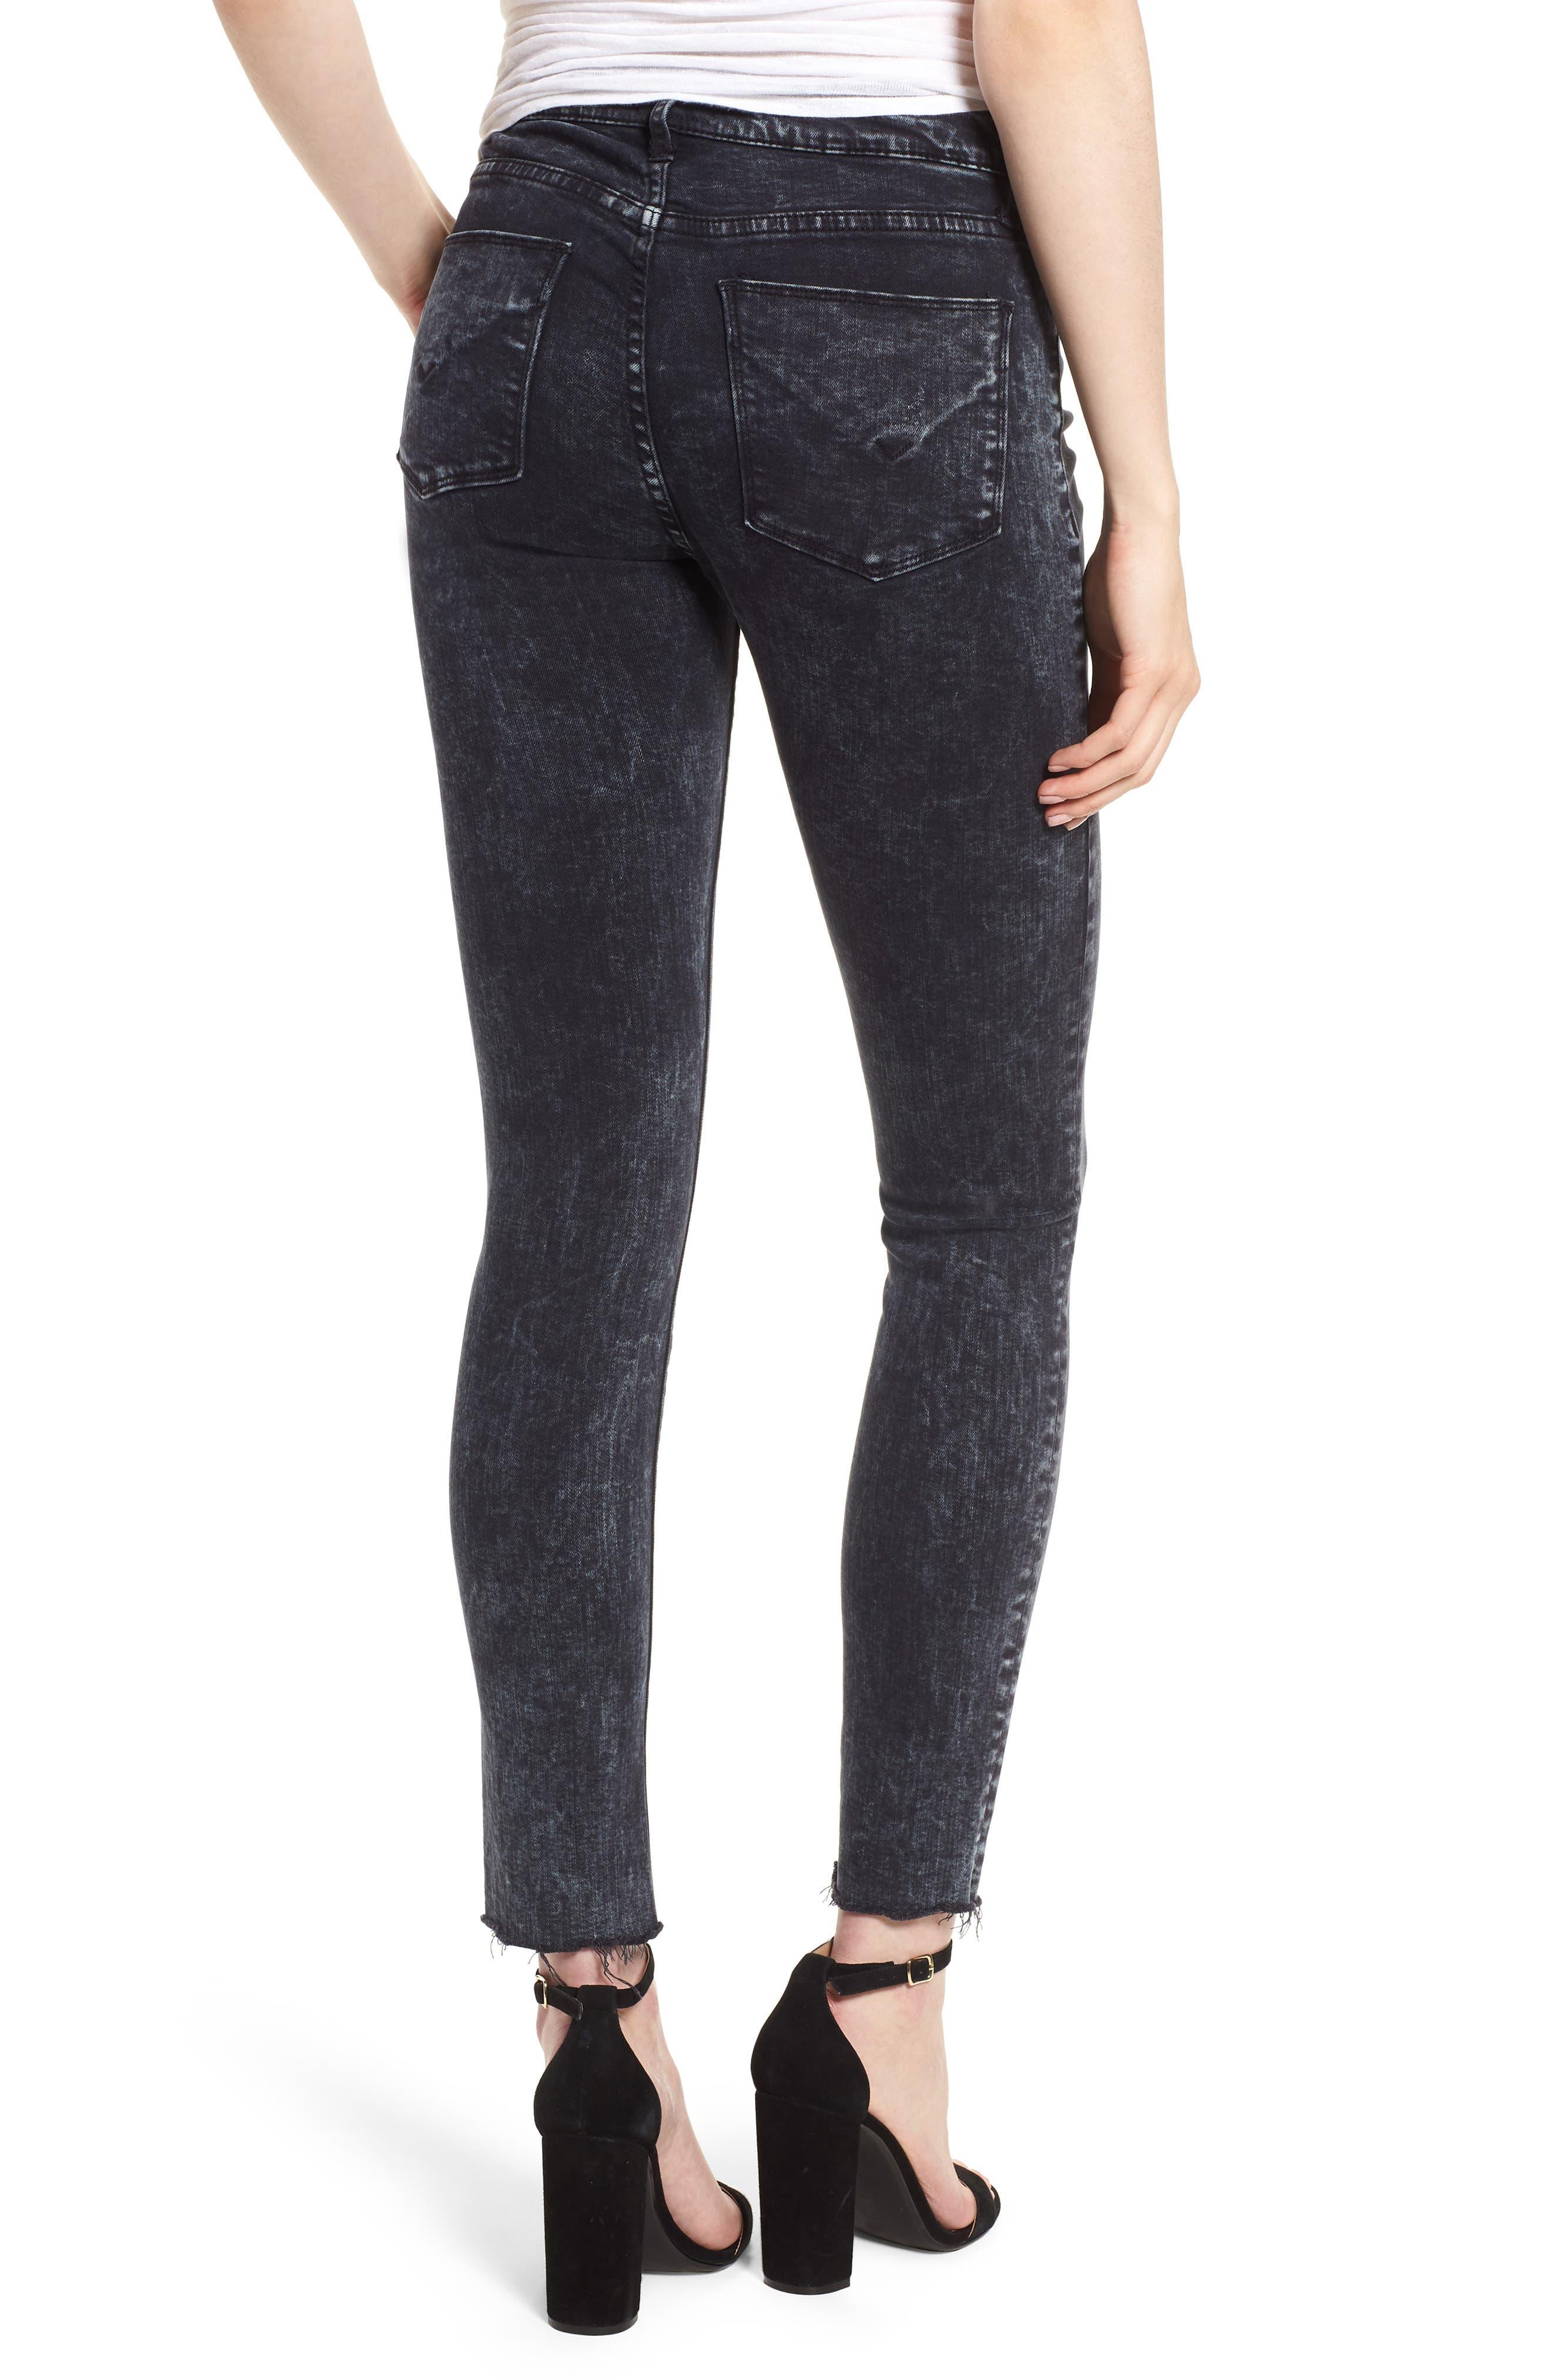 Barbara High Waist Ankle Skinny Jeans,                             Alternate thumbnail 2, color,                             DAINTY